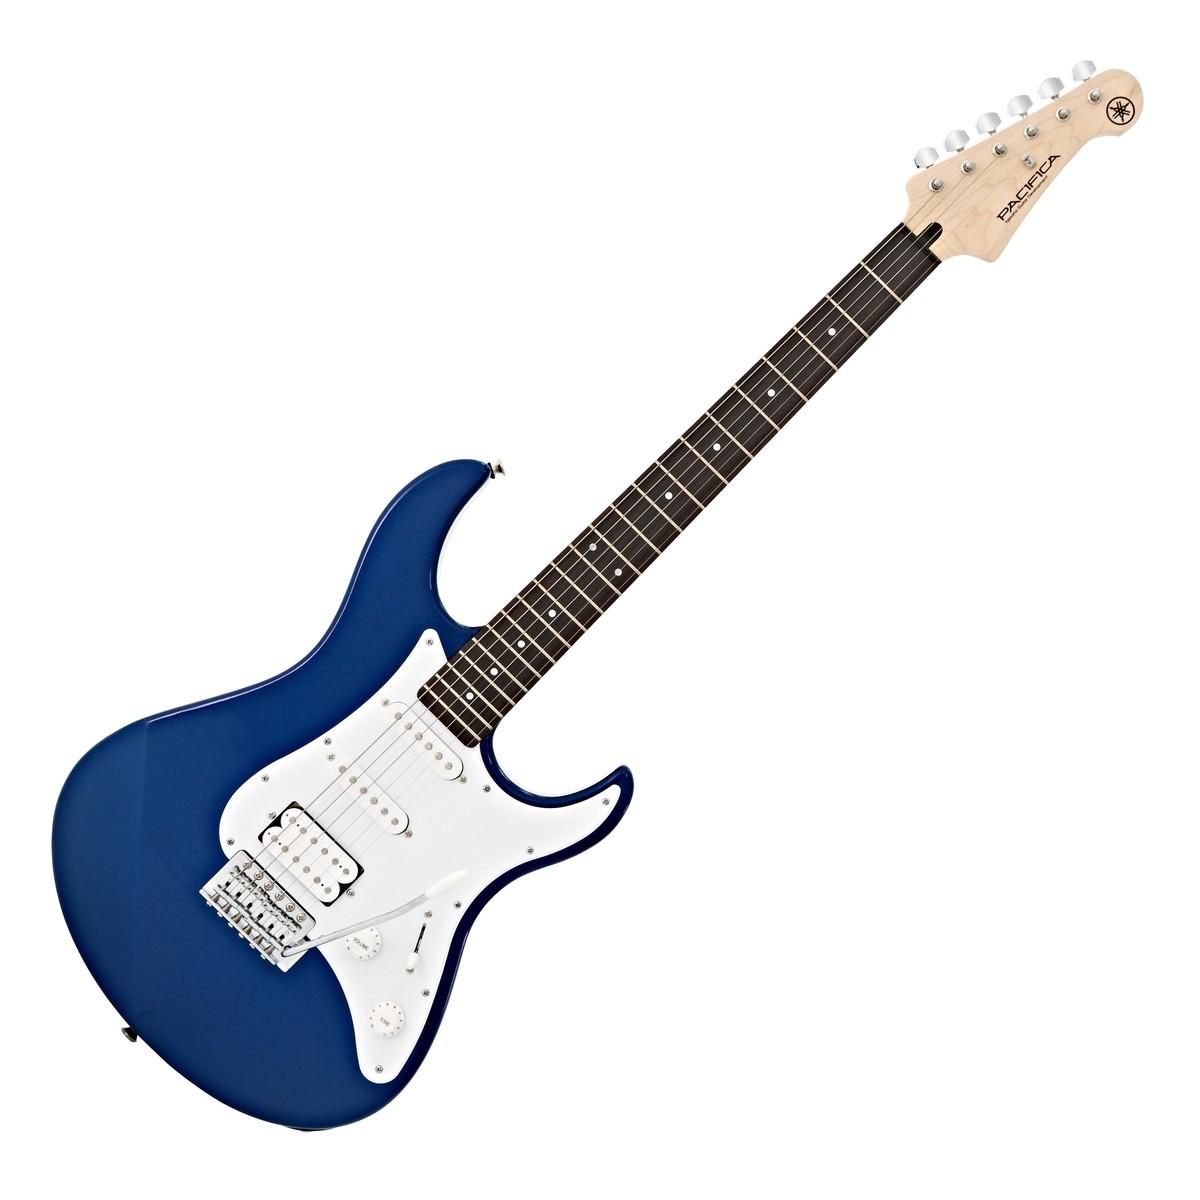 Yamaha Pacifica 012 Guitarra El 233 Ctrica Azul Metalizado